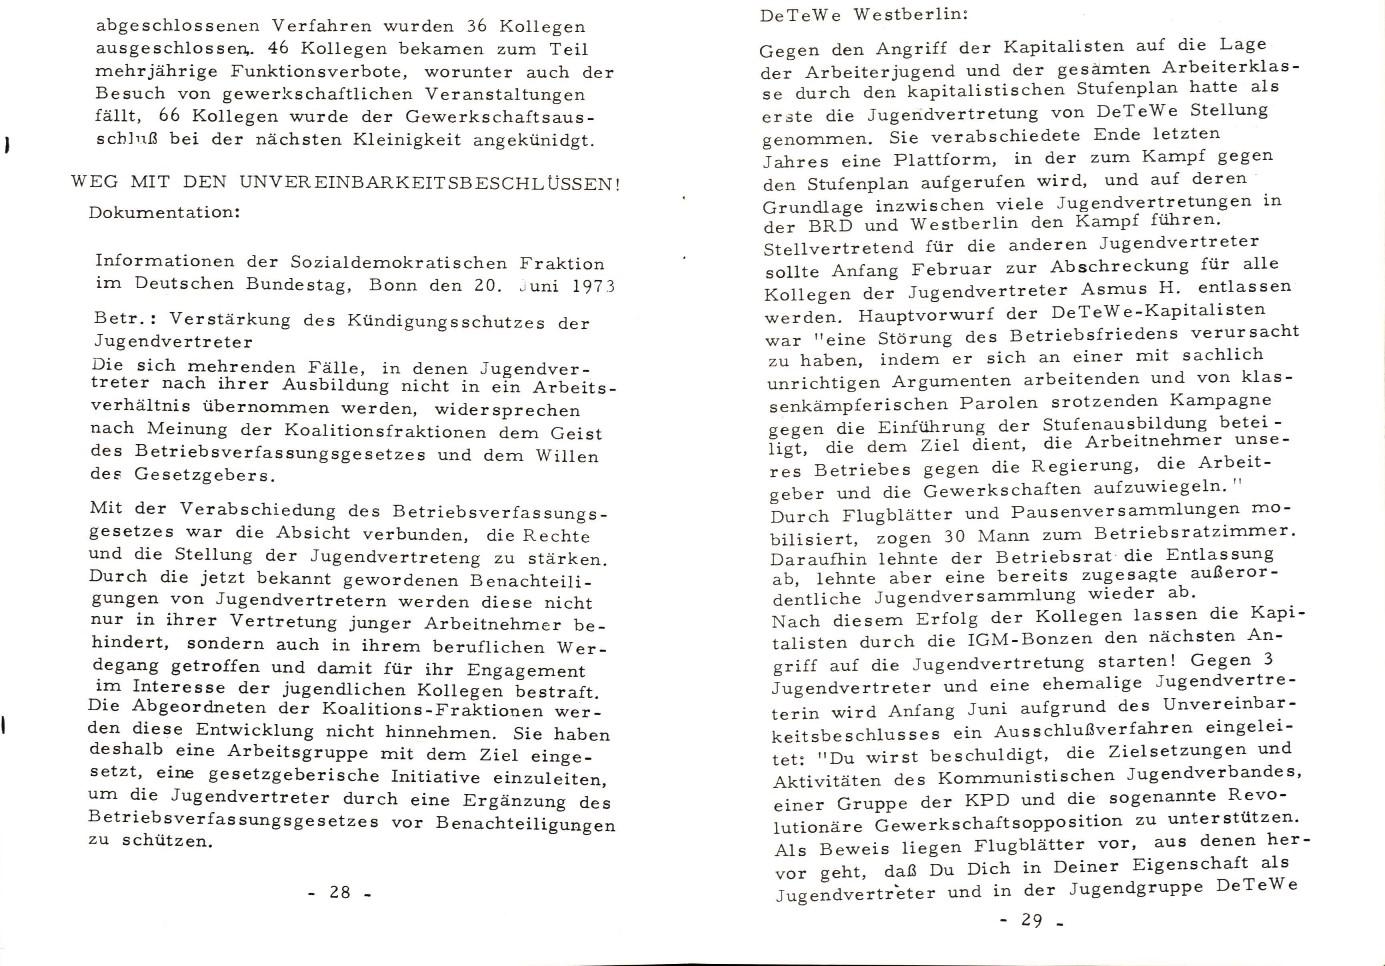 KJV_1973_NK_Arbeiterjugend_16